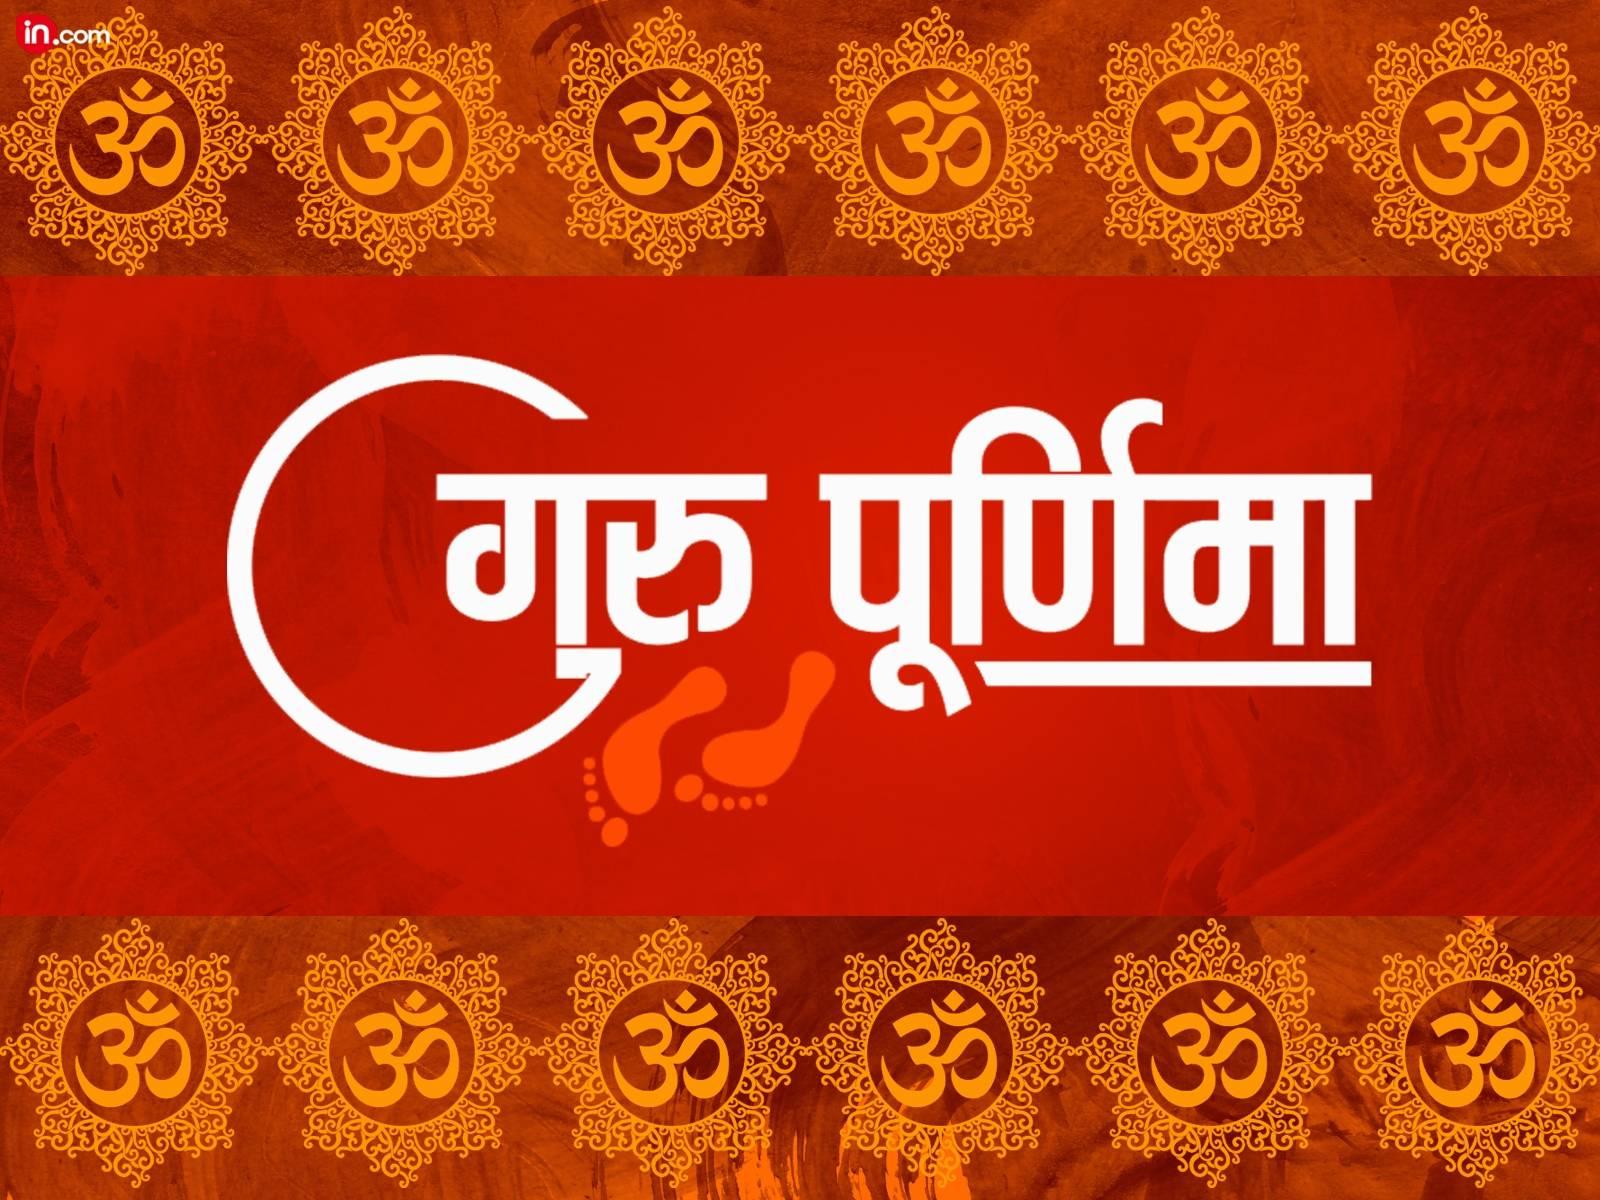 Guru Purnima 2018 Image free download